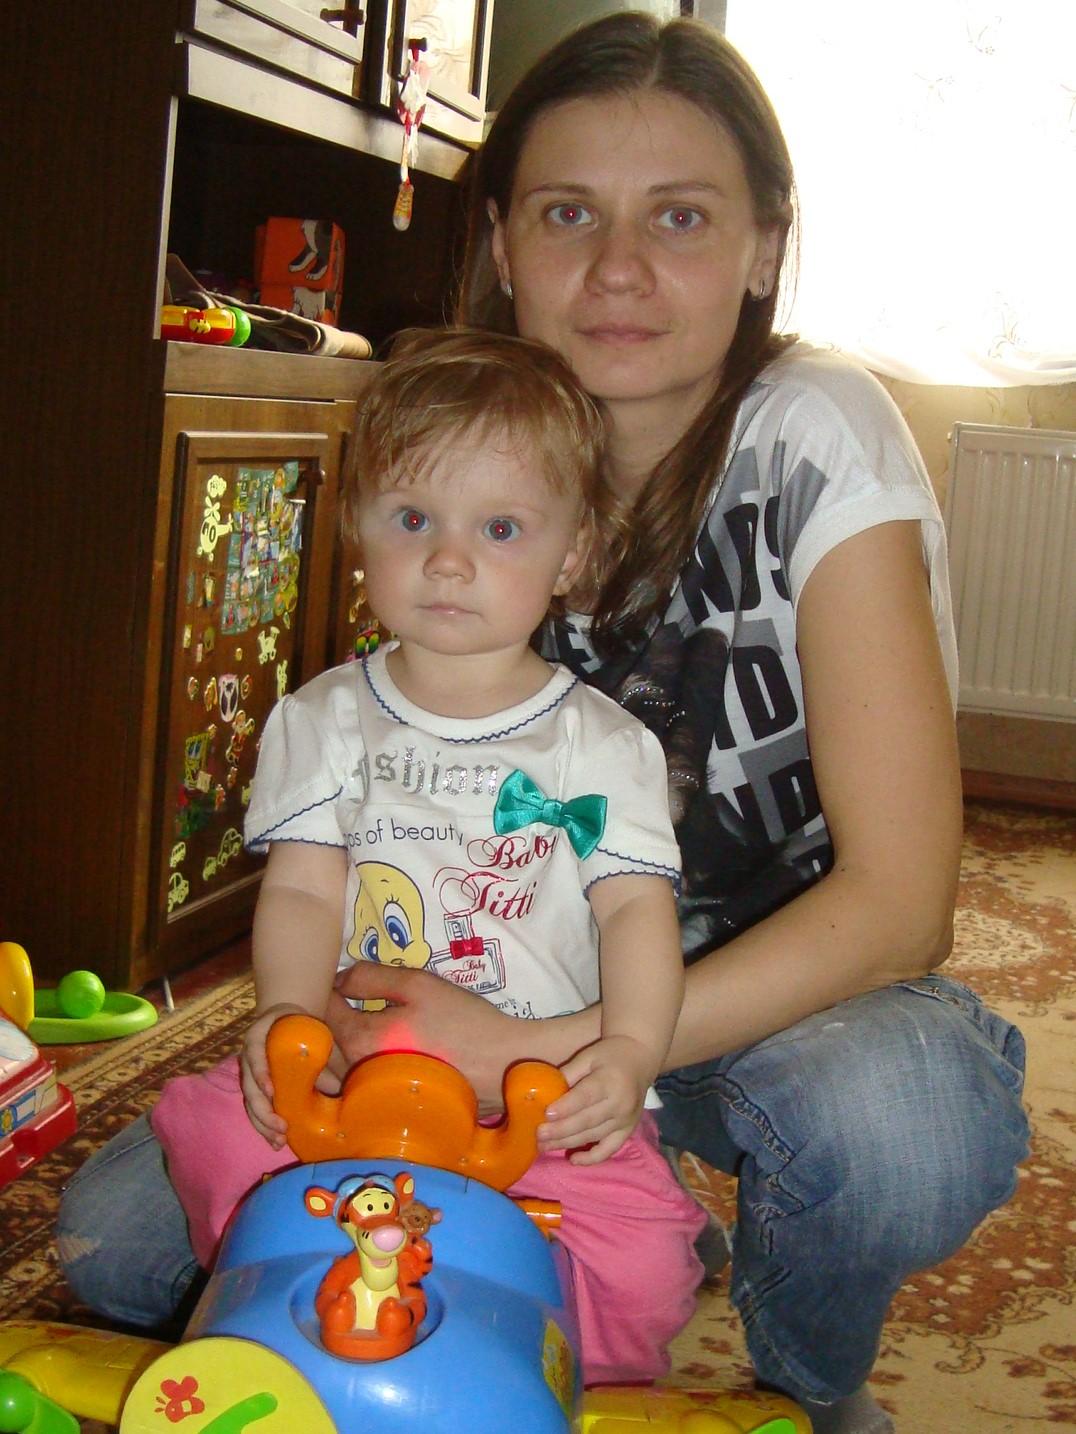 liberanskaya alina